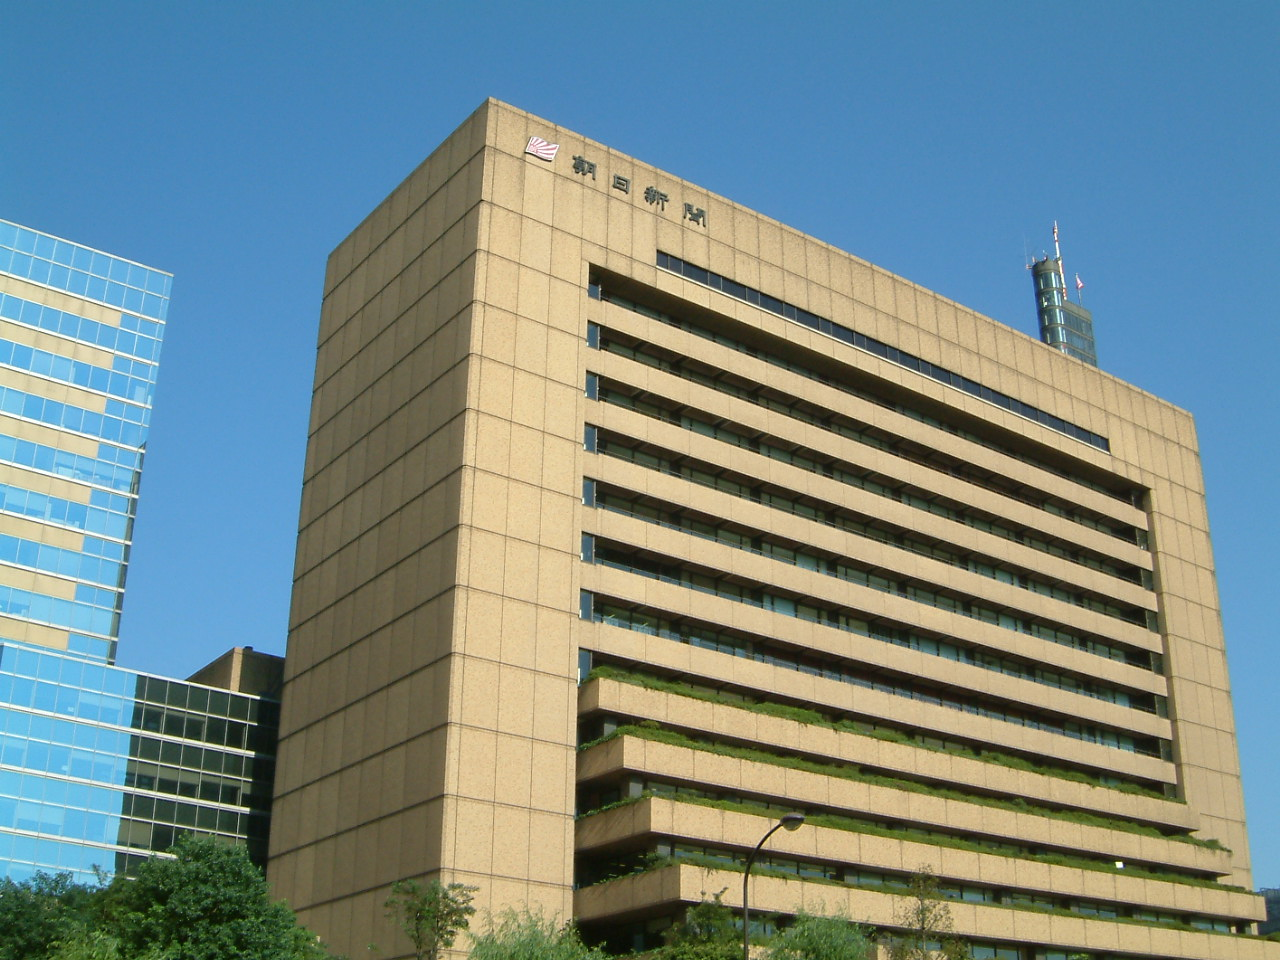 Palazzo del Asahi Shinbun - The Japanese Dreams